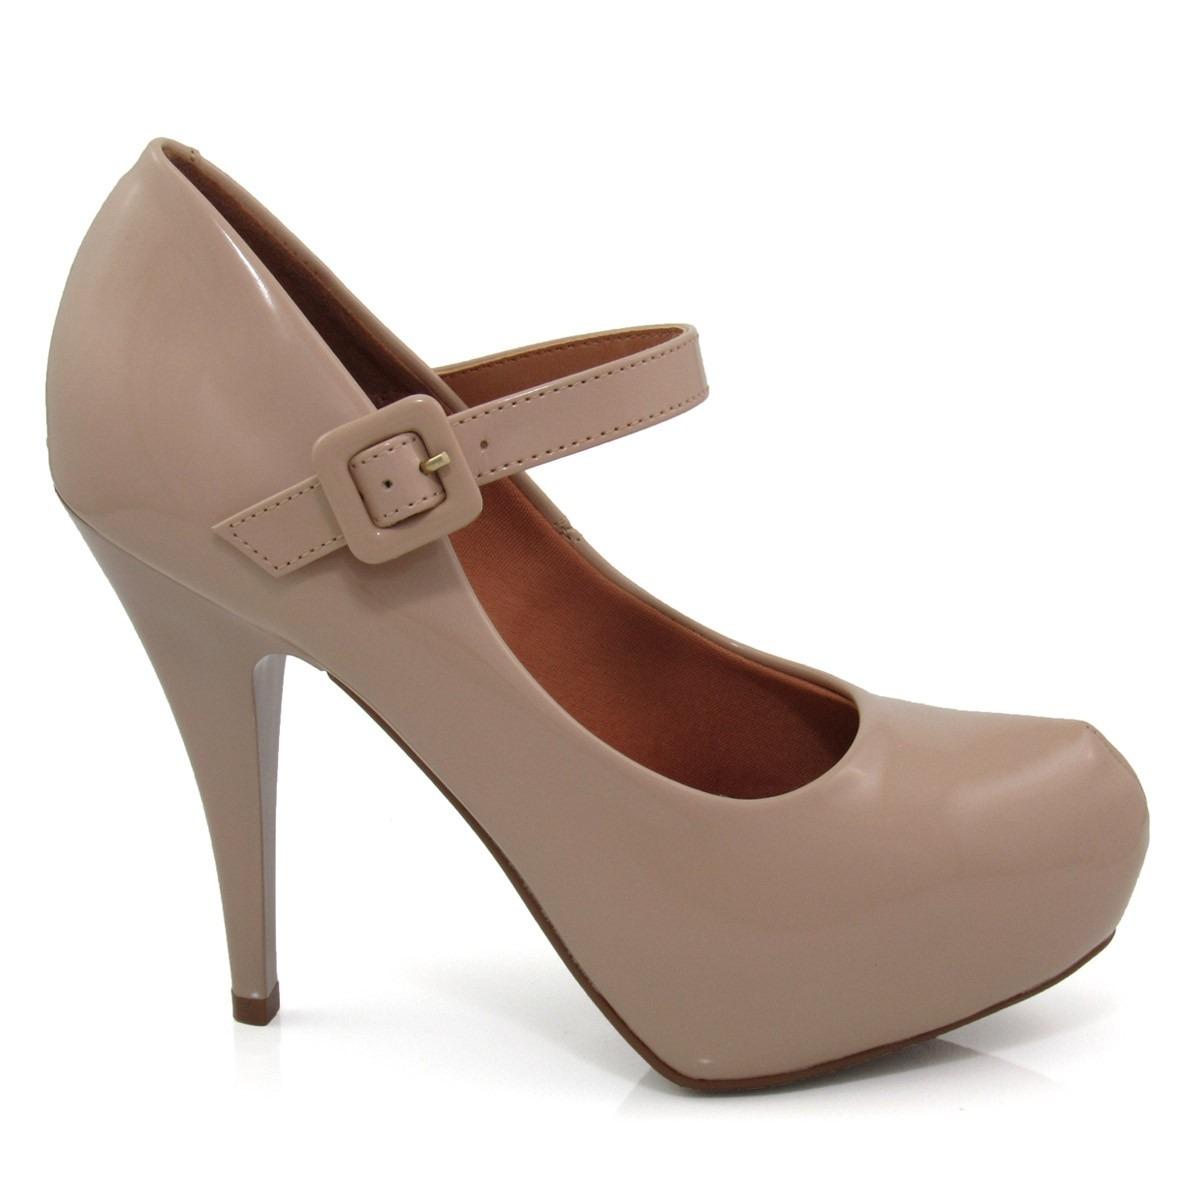 5d64ff461c sapato feminino scarpin vizzano 1143304 boneca verniz. Carregando zoom.